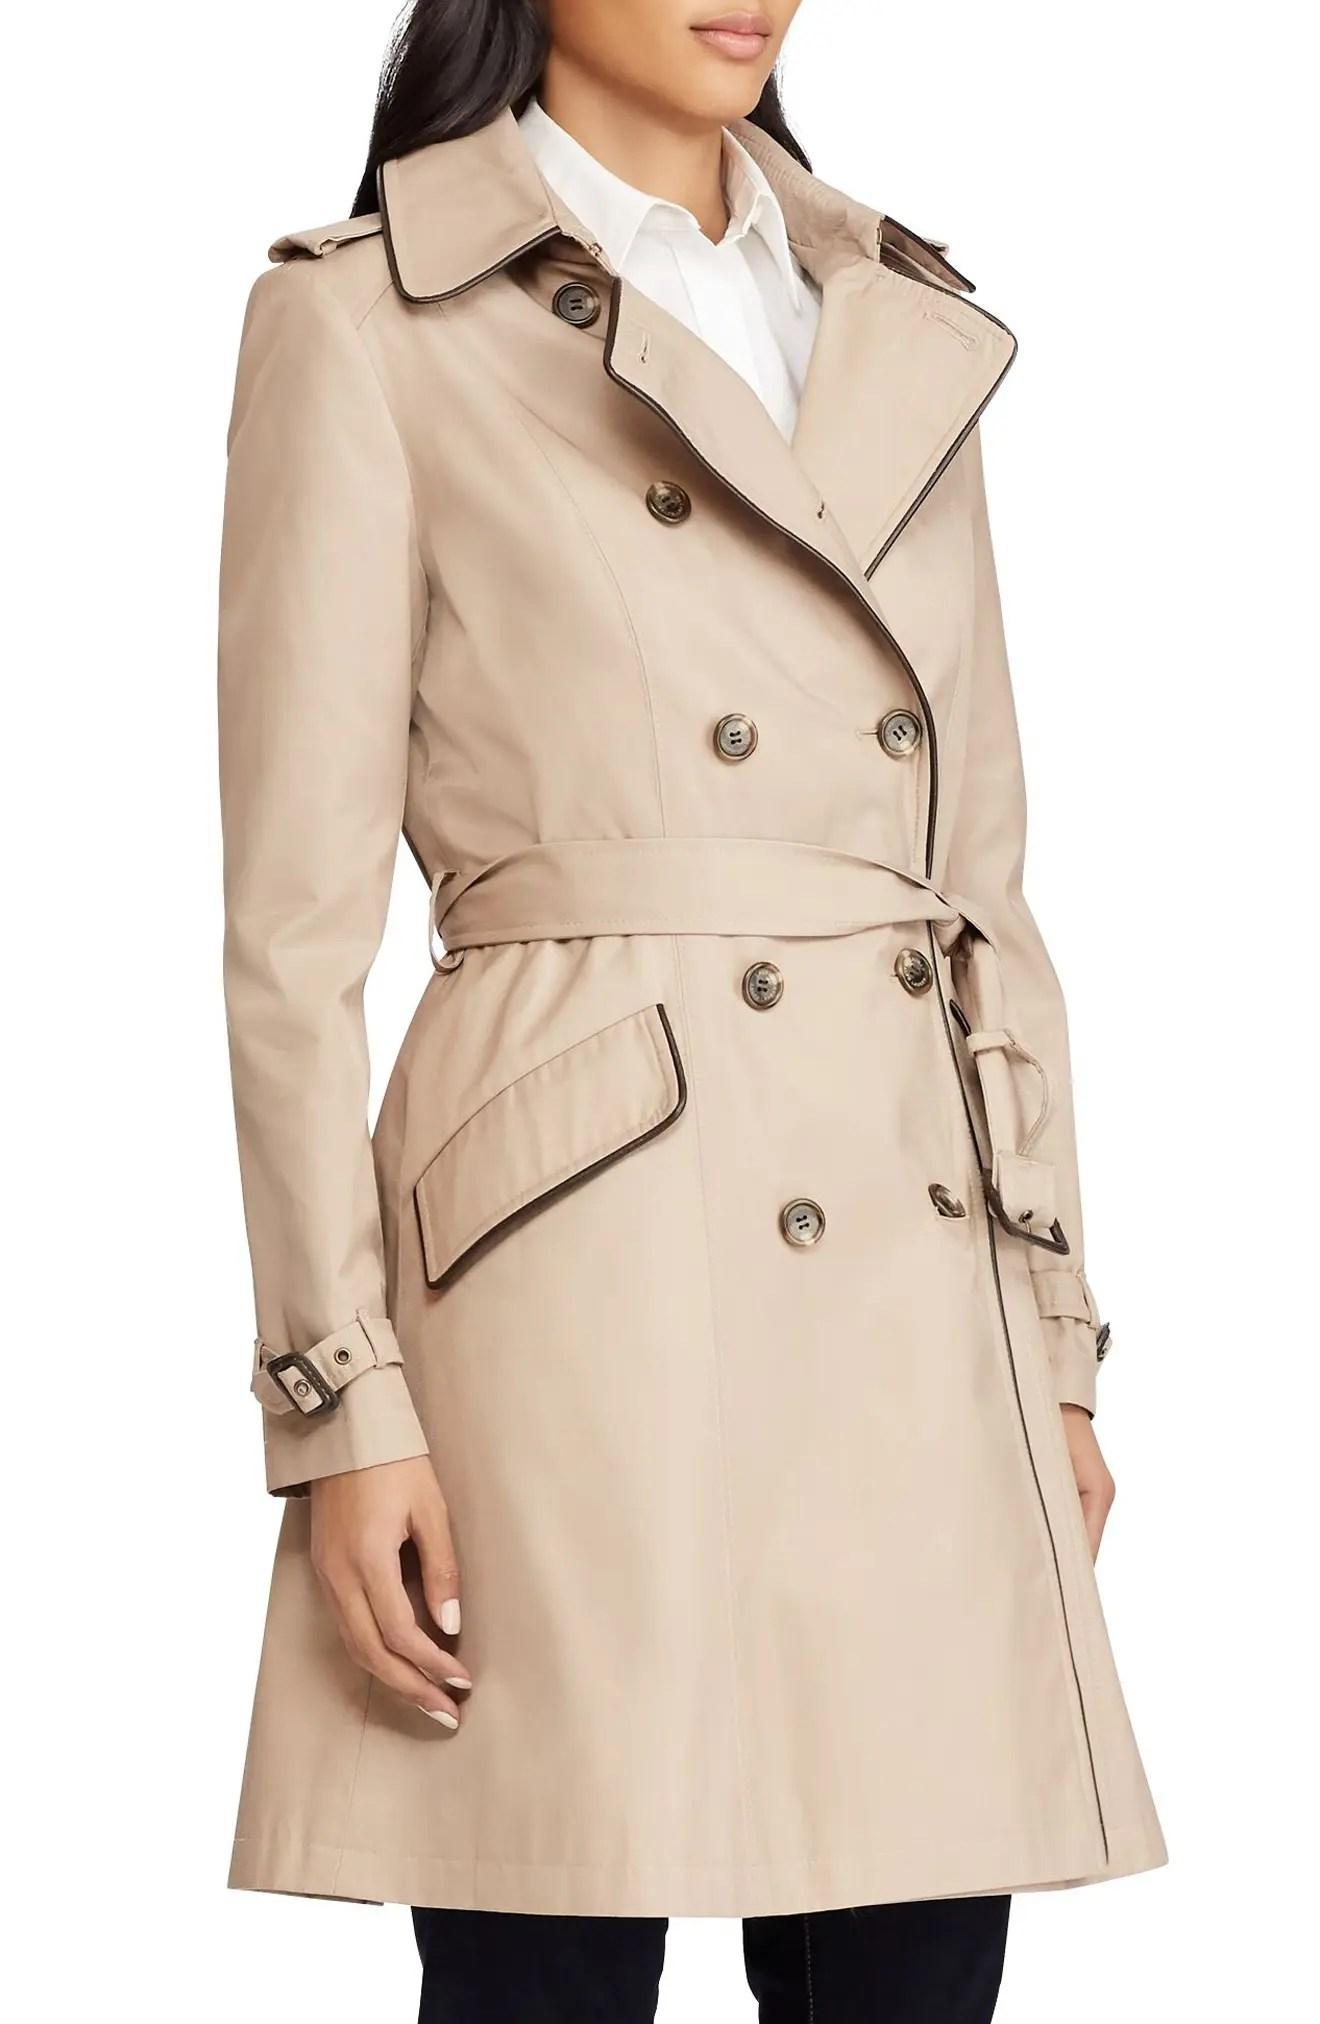 Petite Short Trench Coat $240